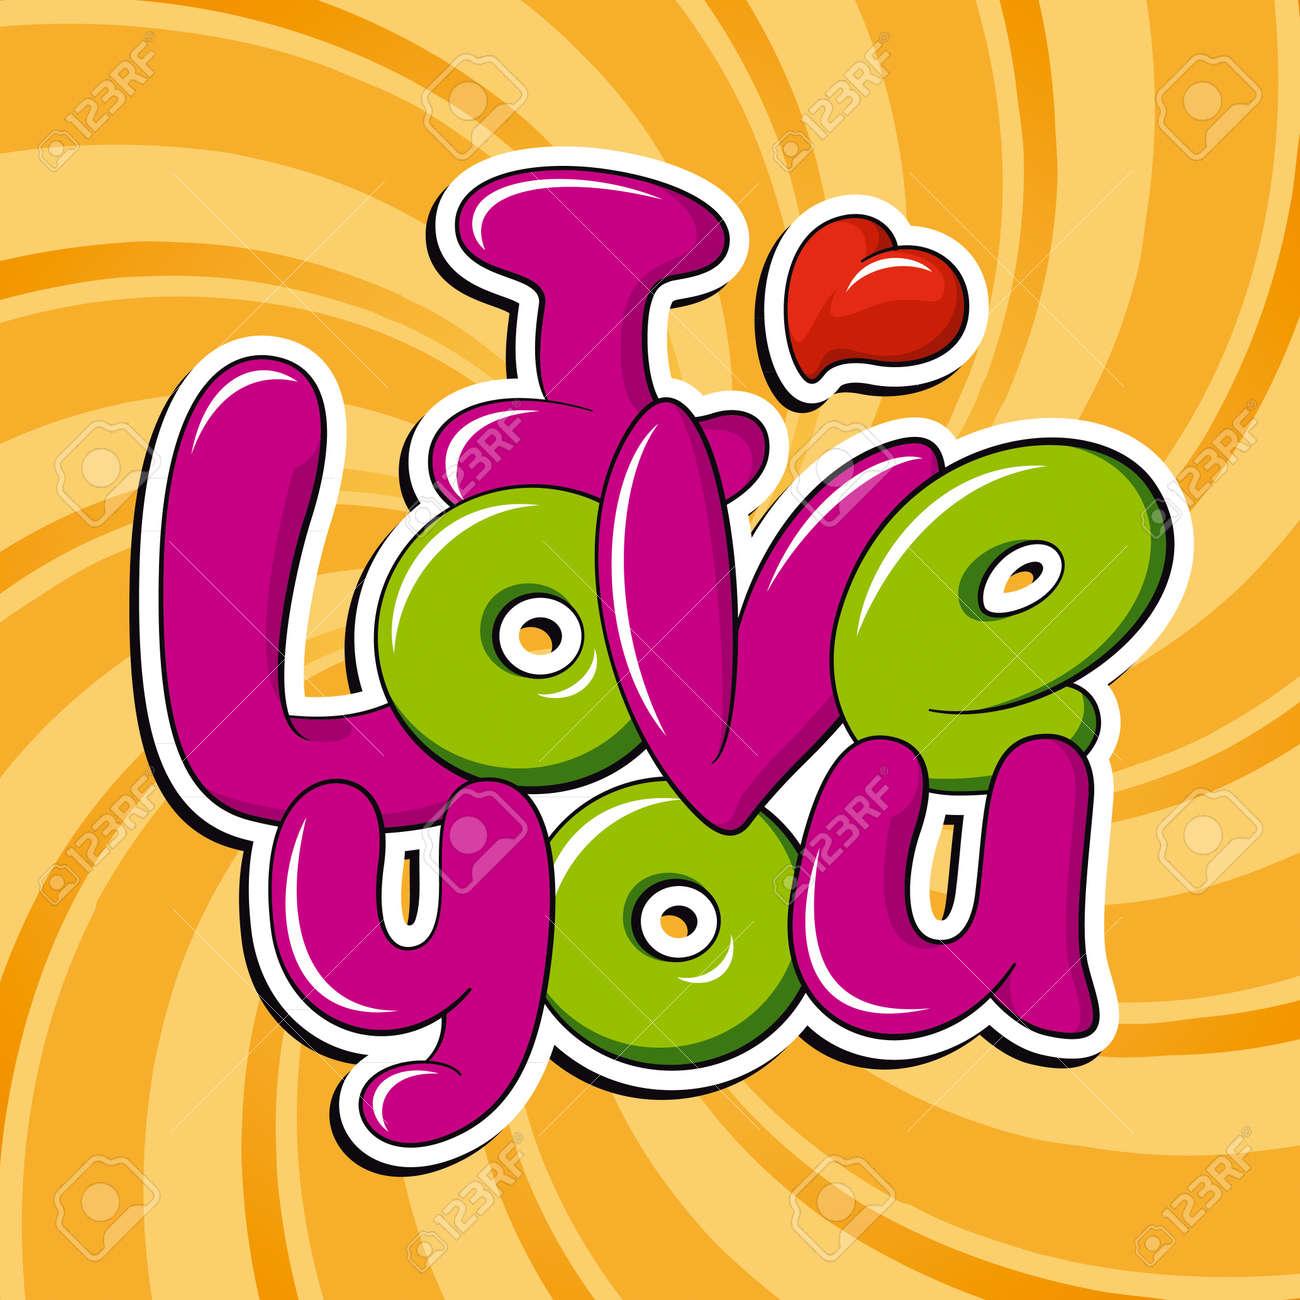 I Love You, vector inscription - 18671338